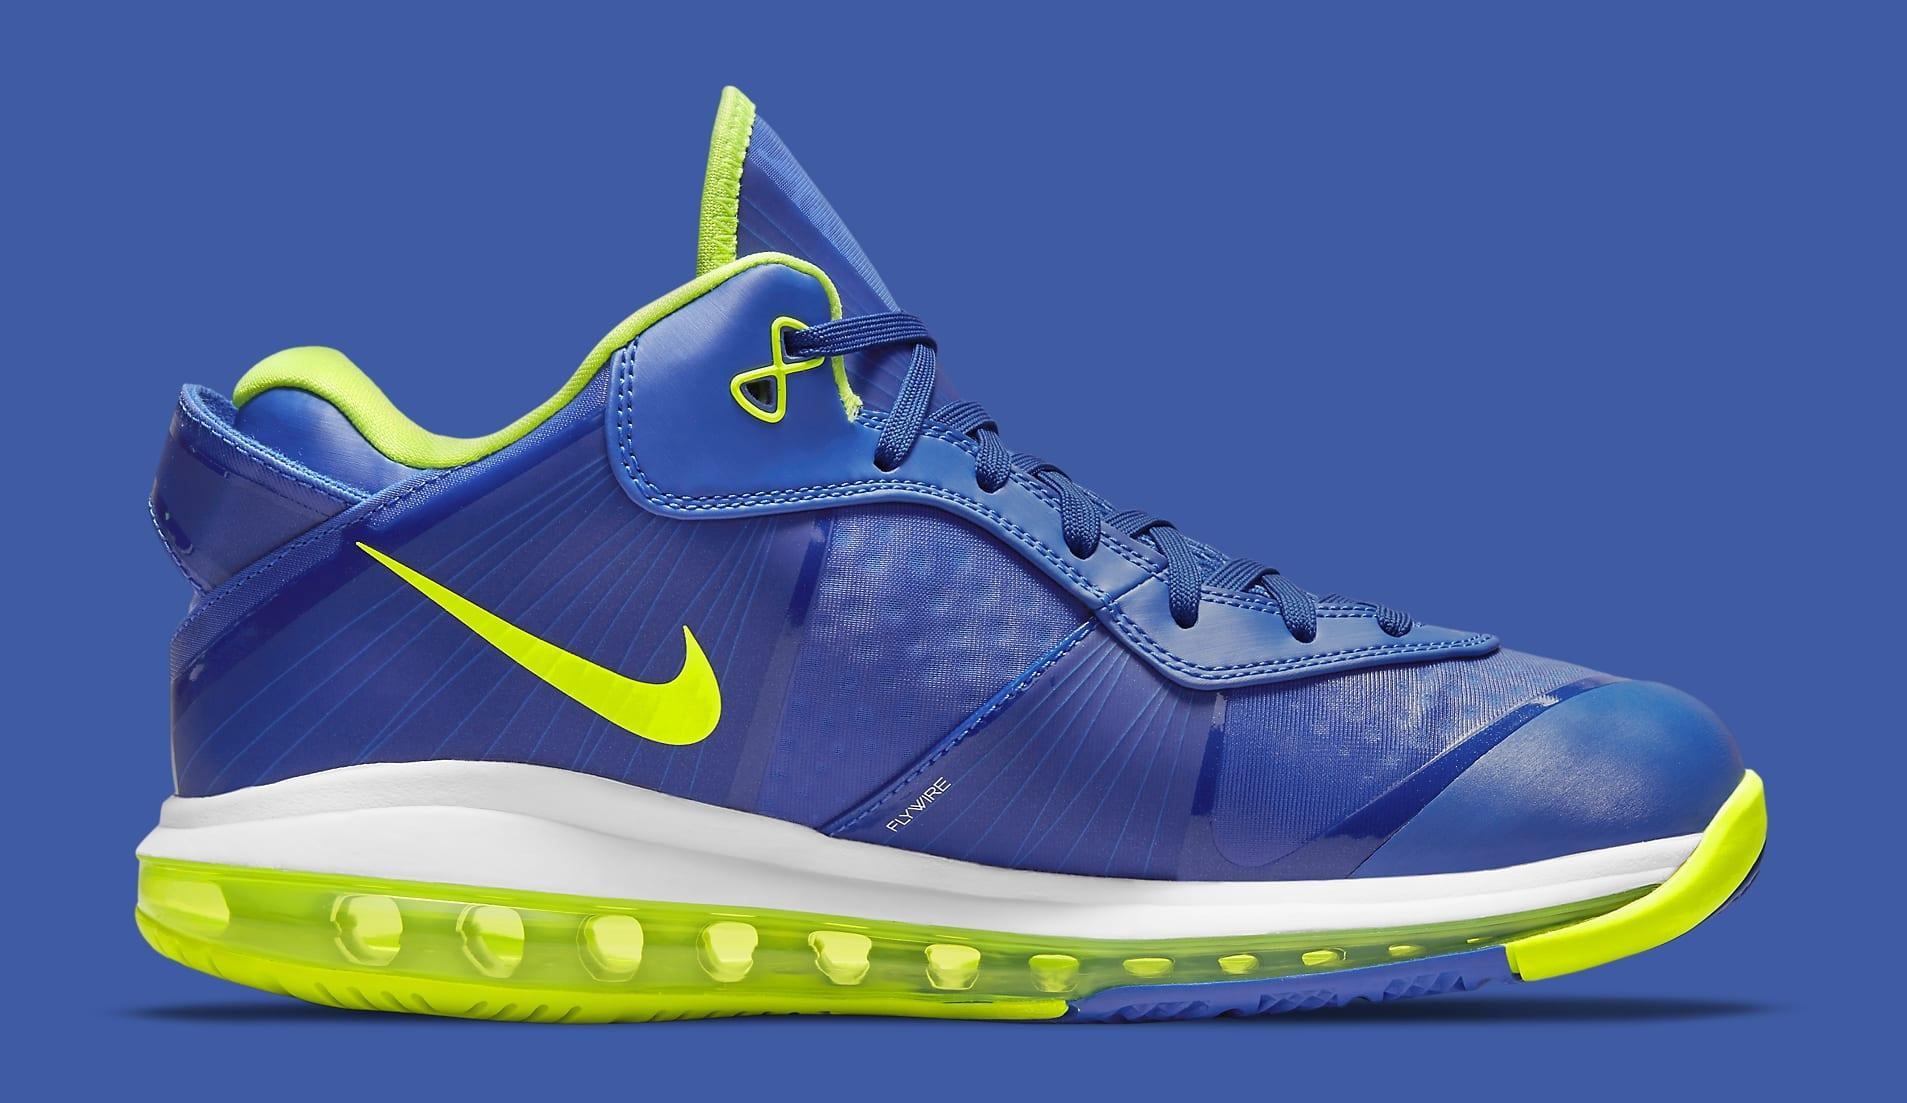 Nike LeBron 8 Low 'Sprite' 2021 DN1581-400 Medial